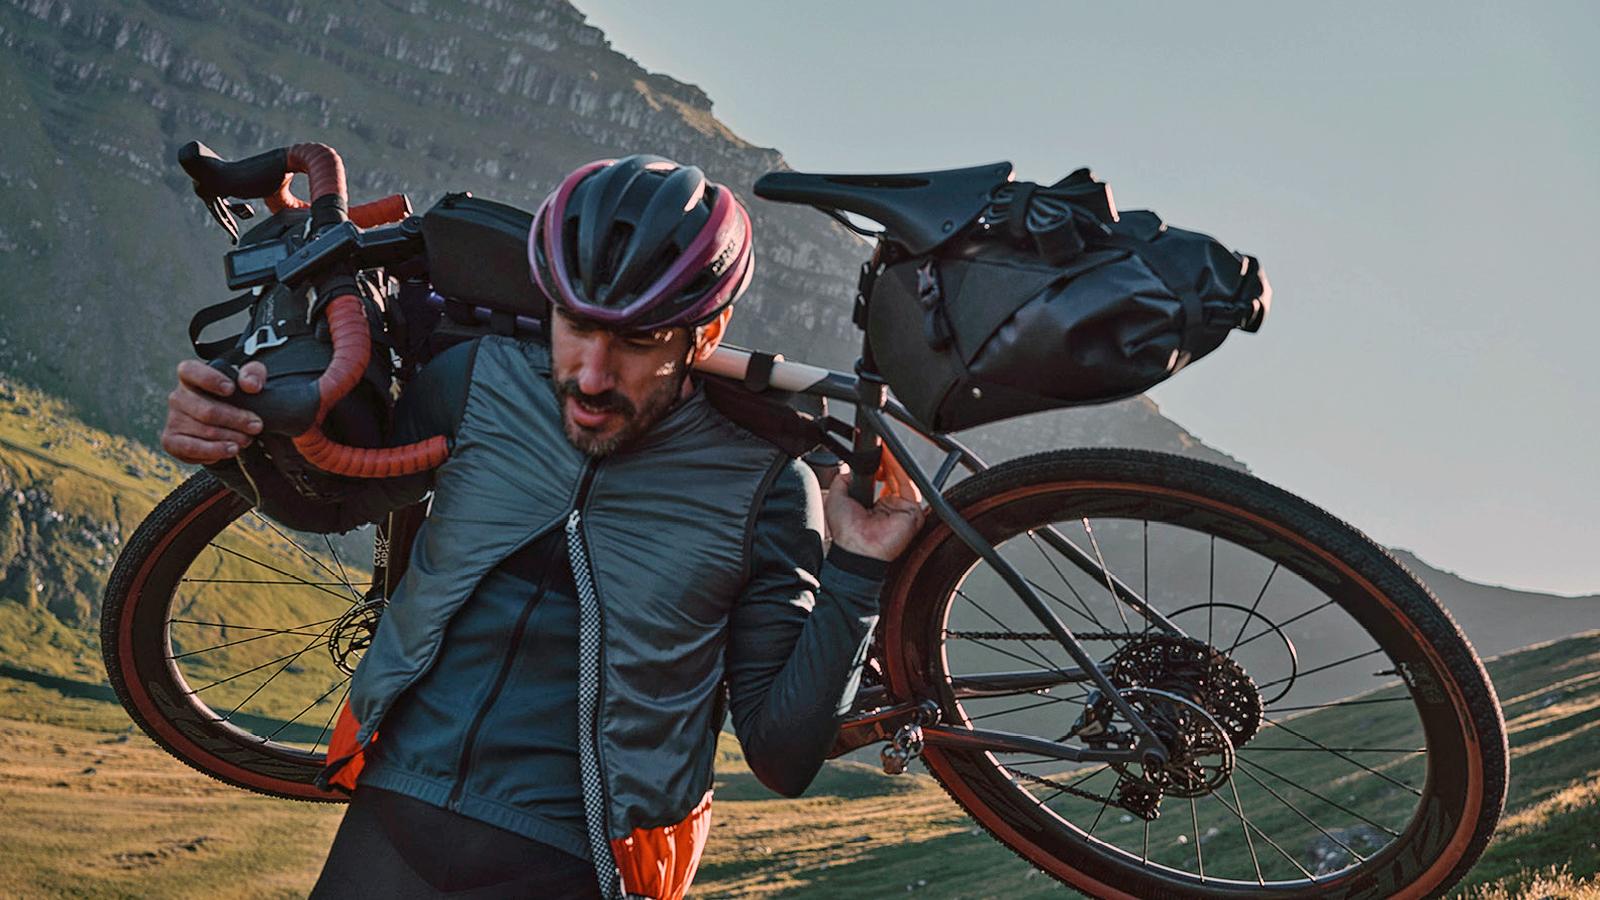 Bikepacking cover image